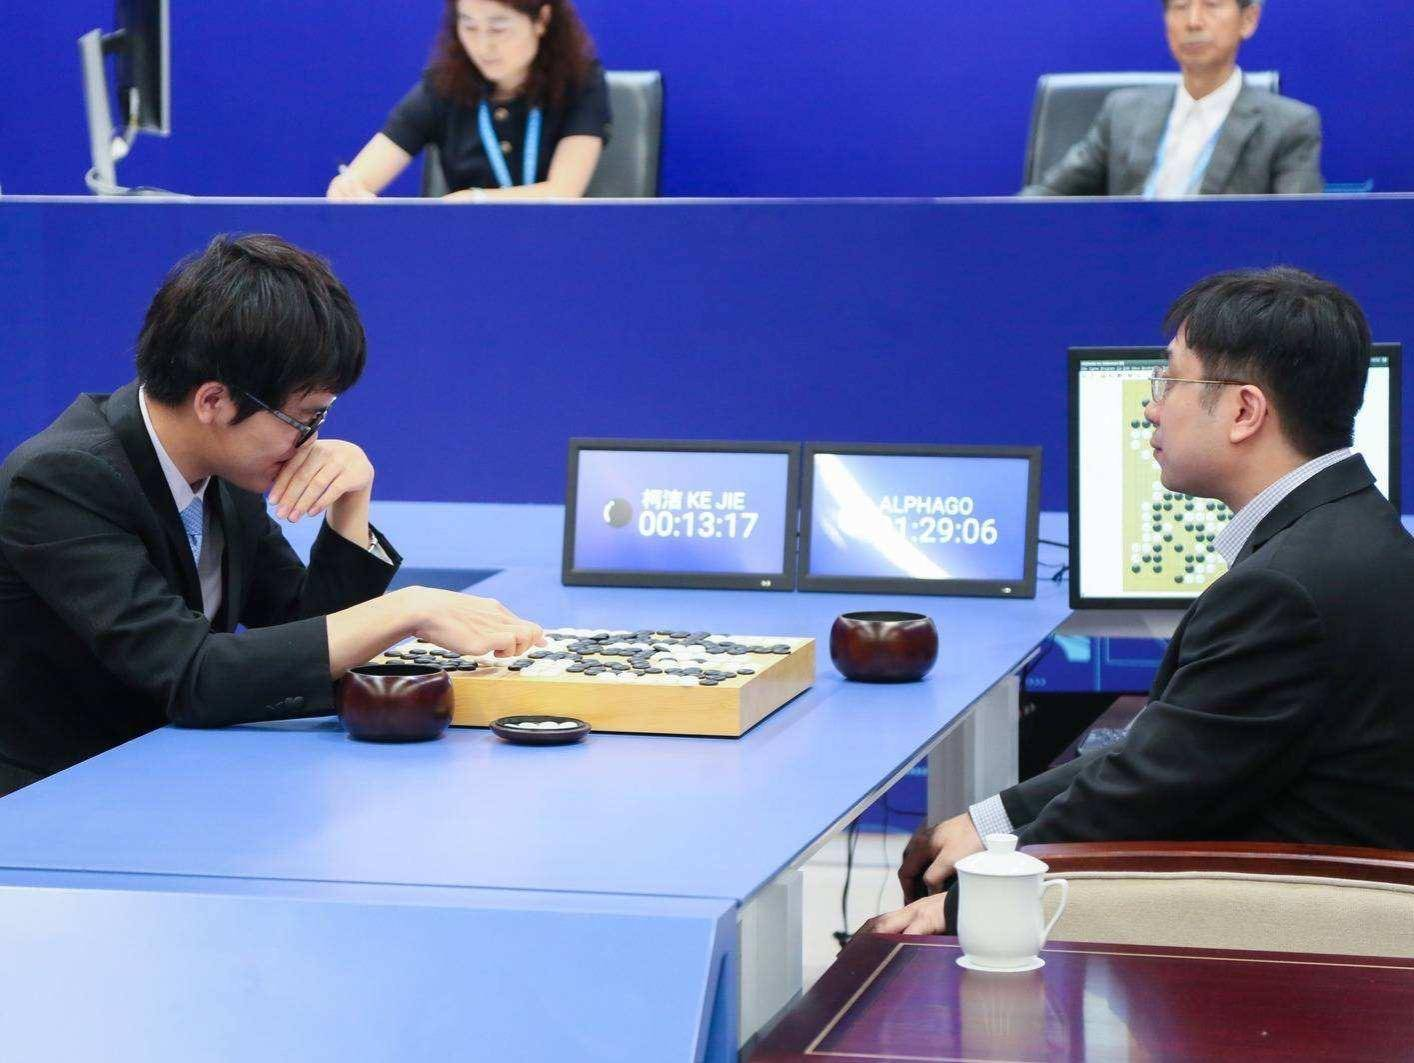 AlphaGo 的爆红,其实是一场营销